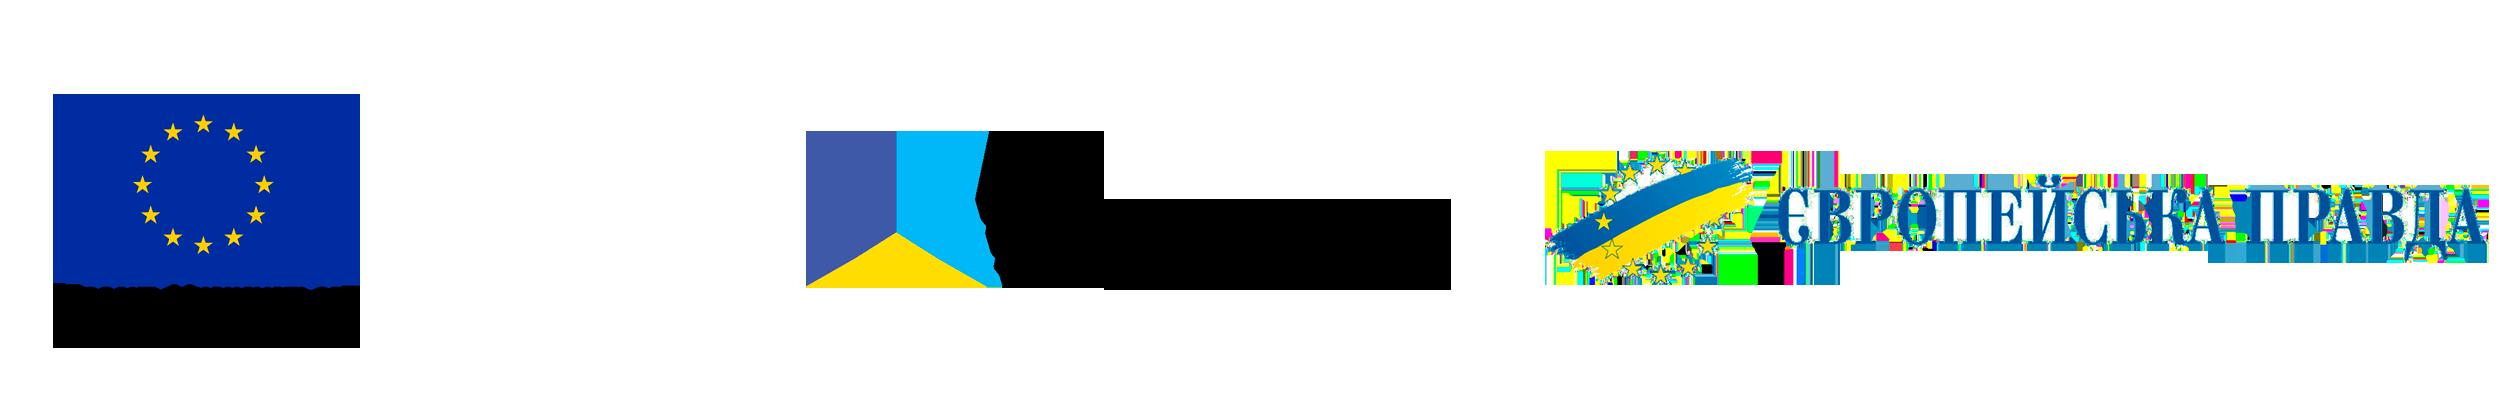 rfr_logo